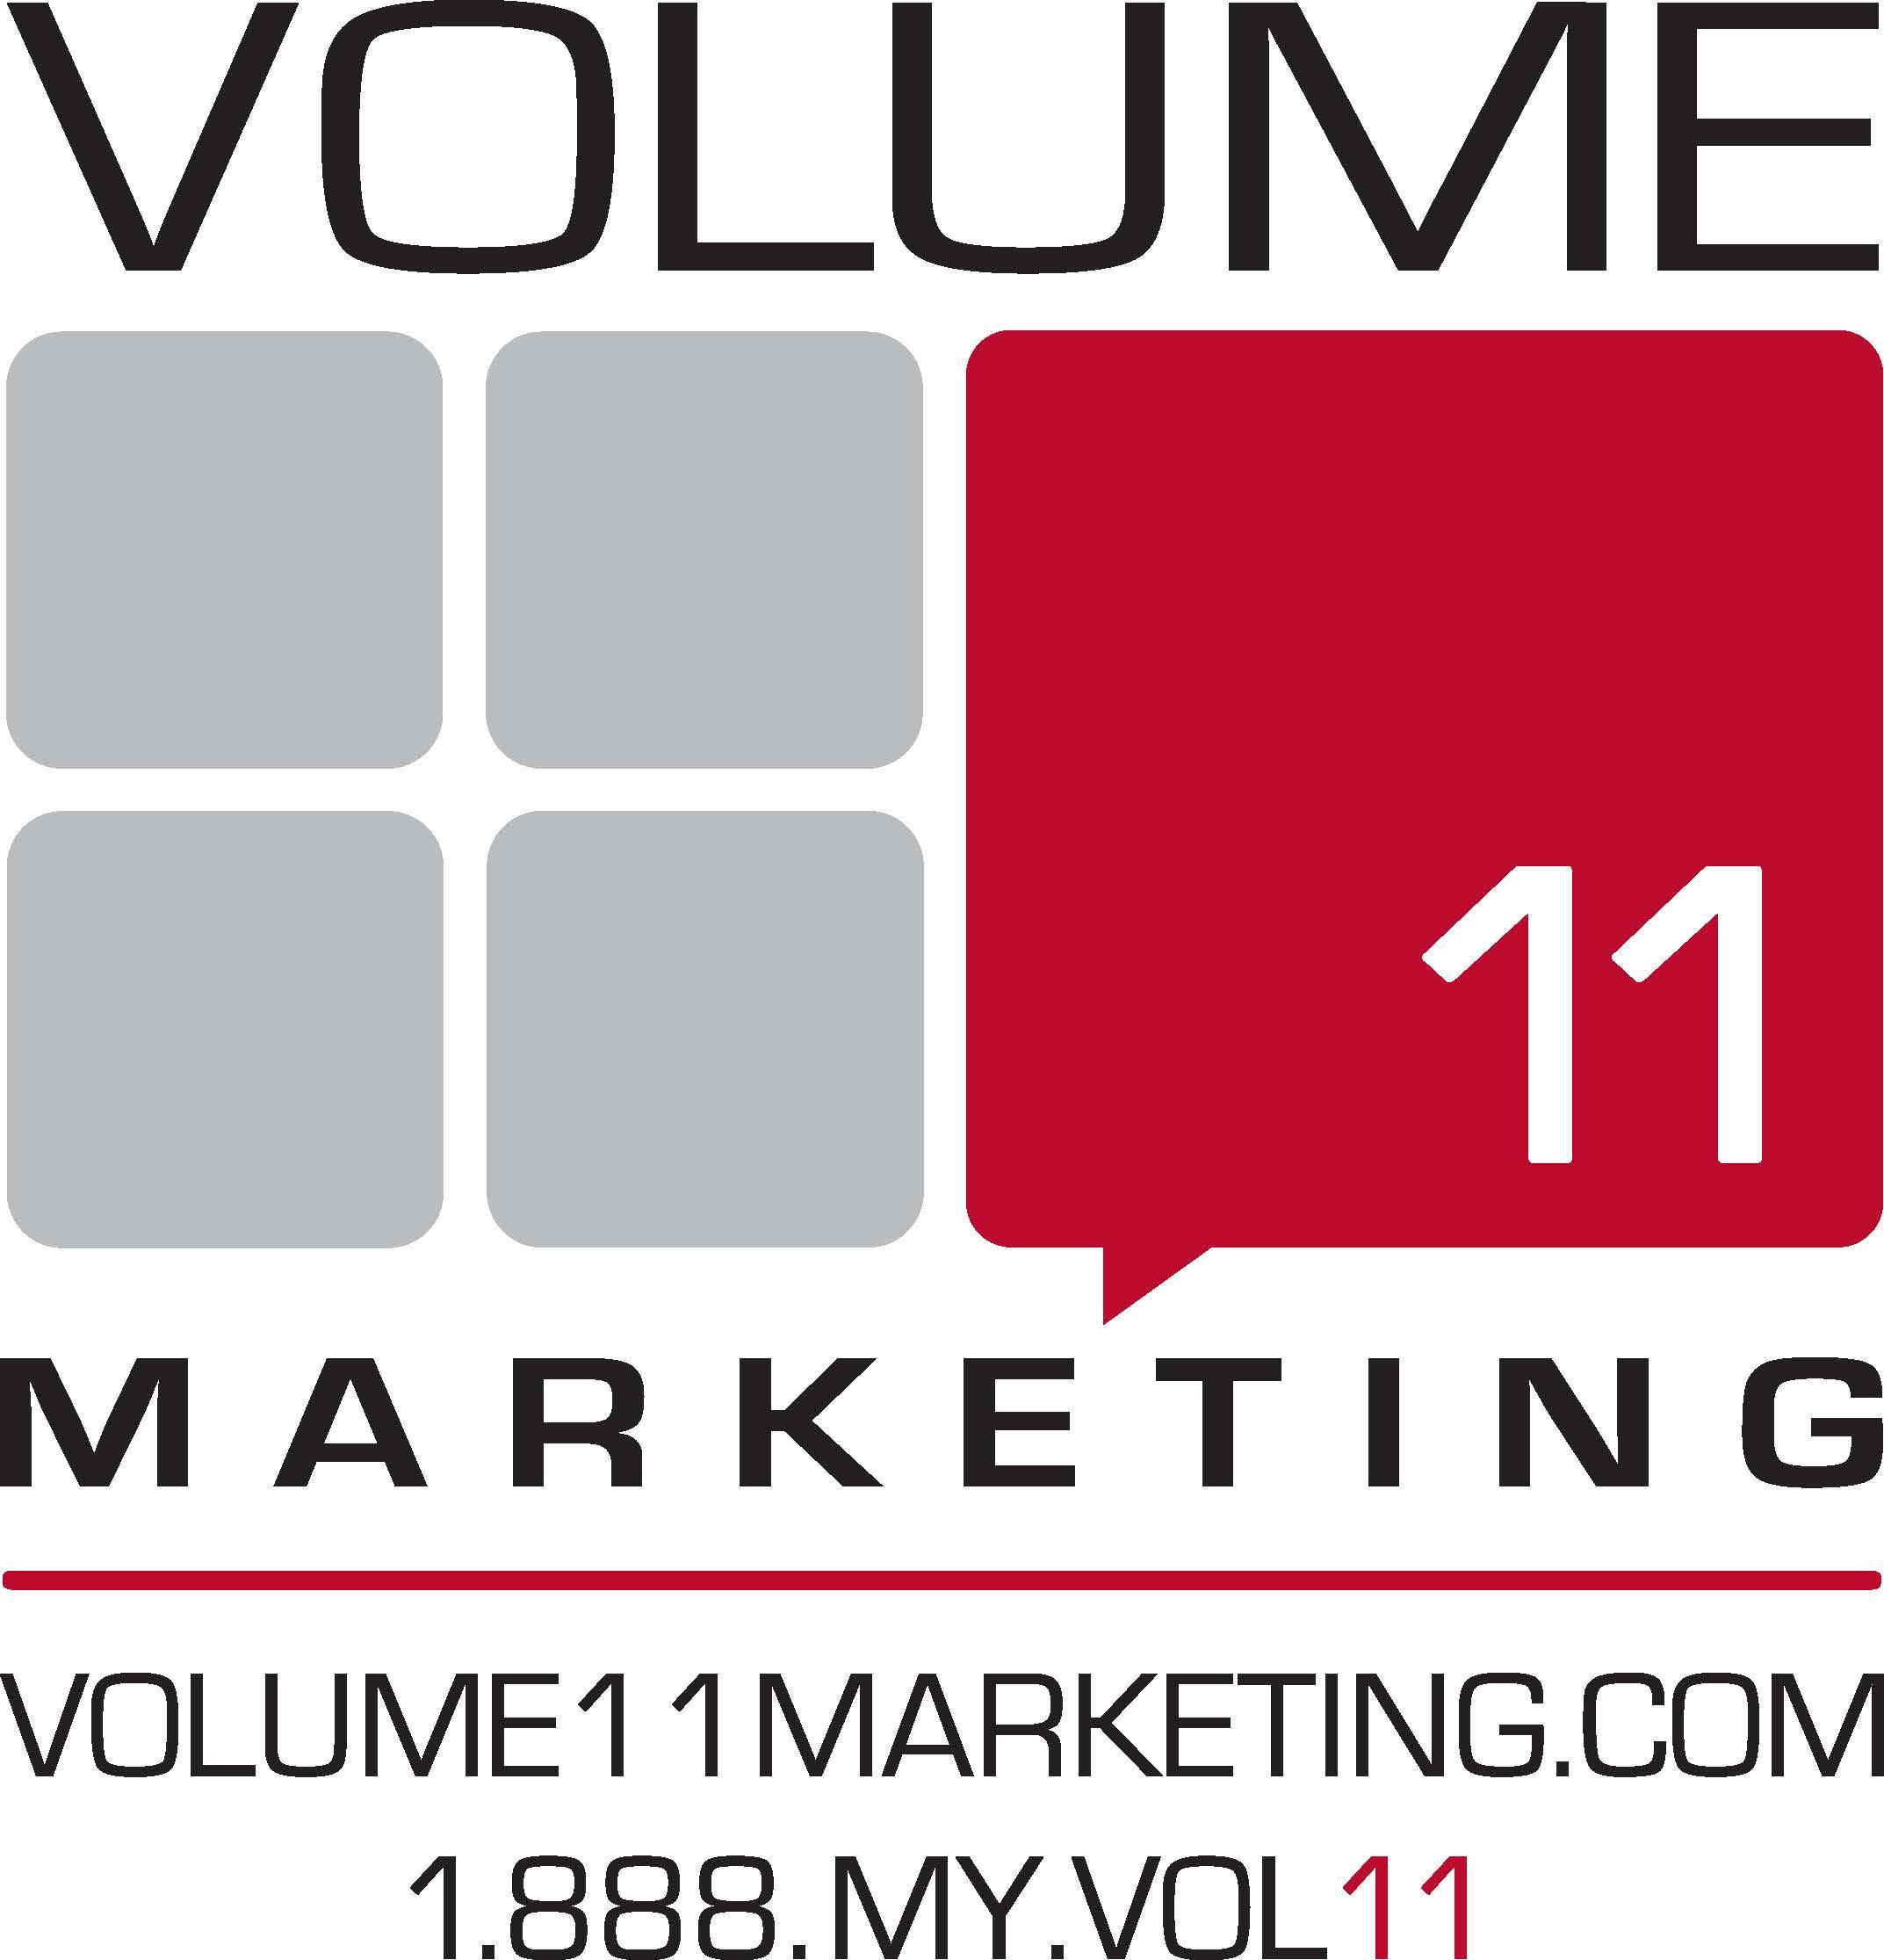 vol11-logo-web and phone.jpg